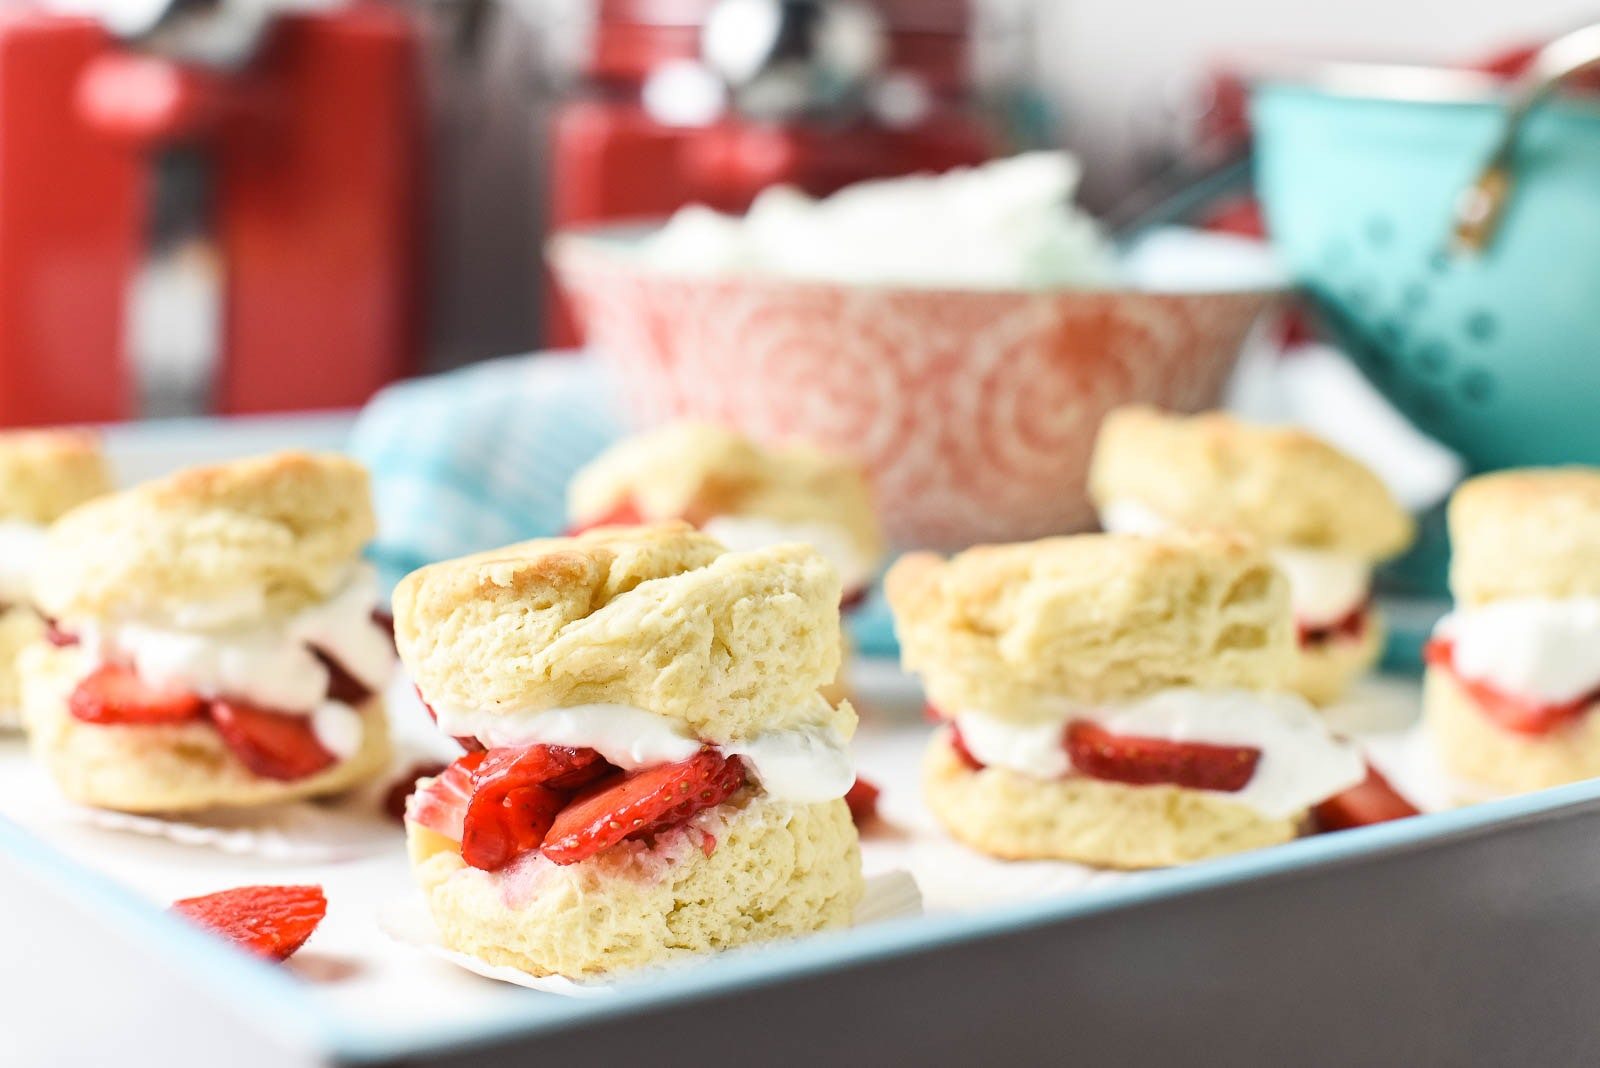 Strawberry Shortcake Sliders Perfect for Summer Picnics